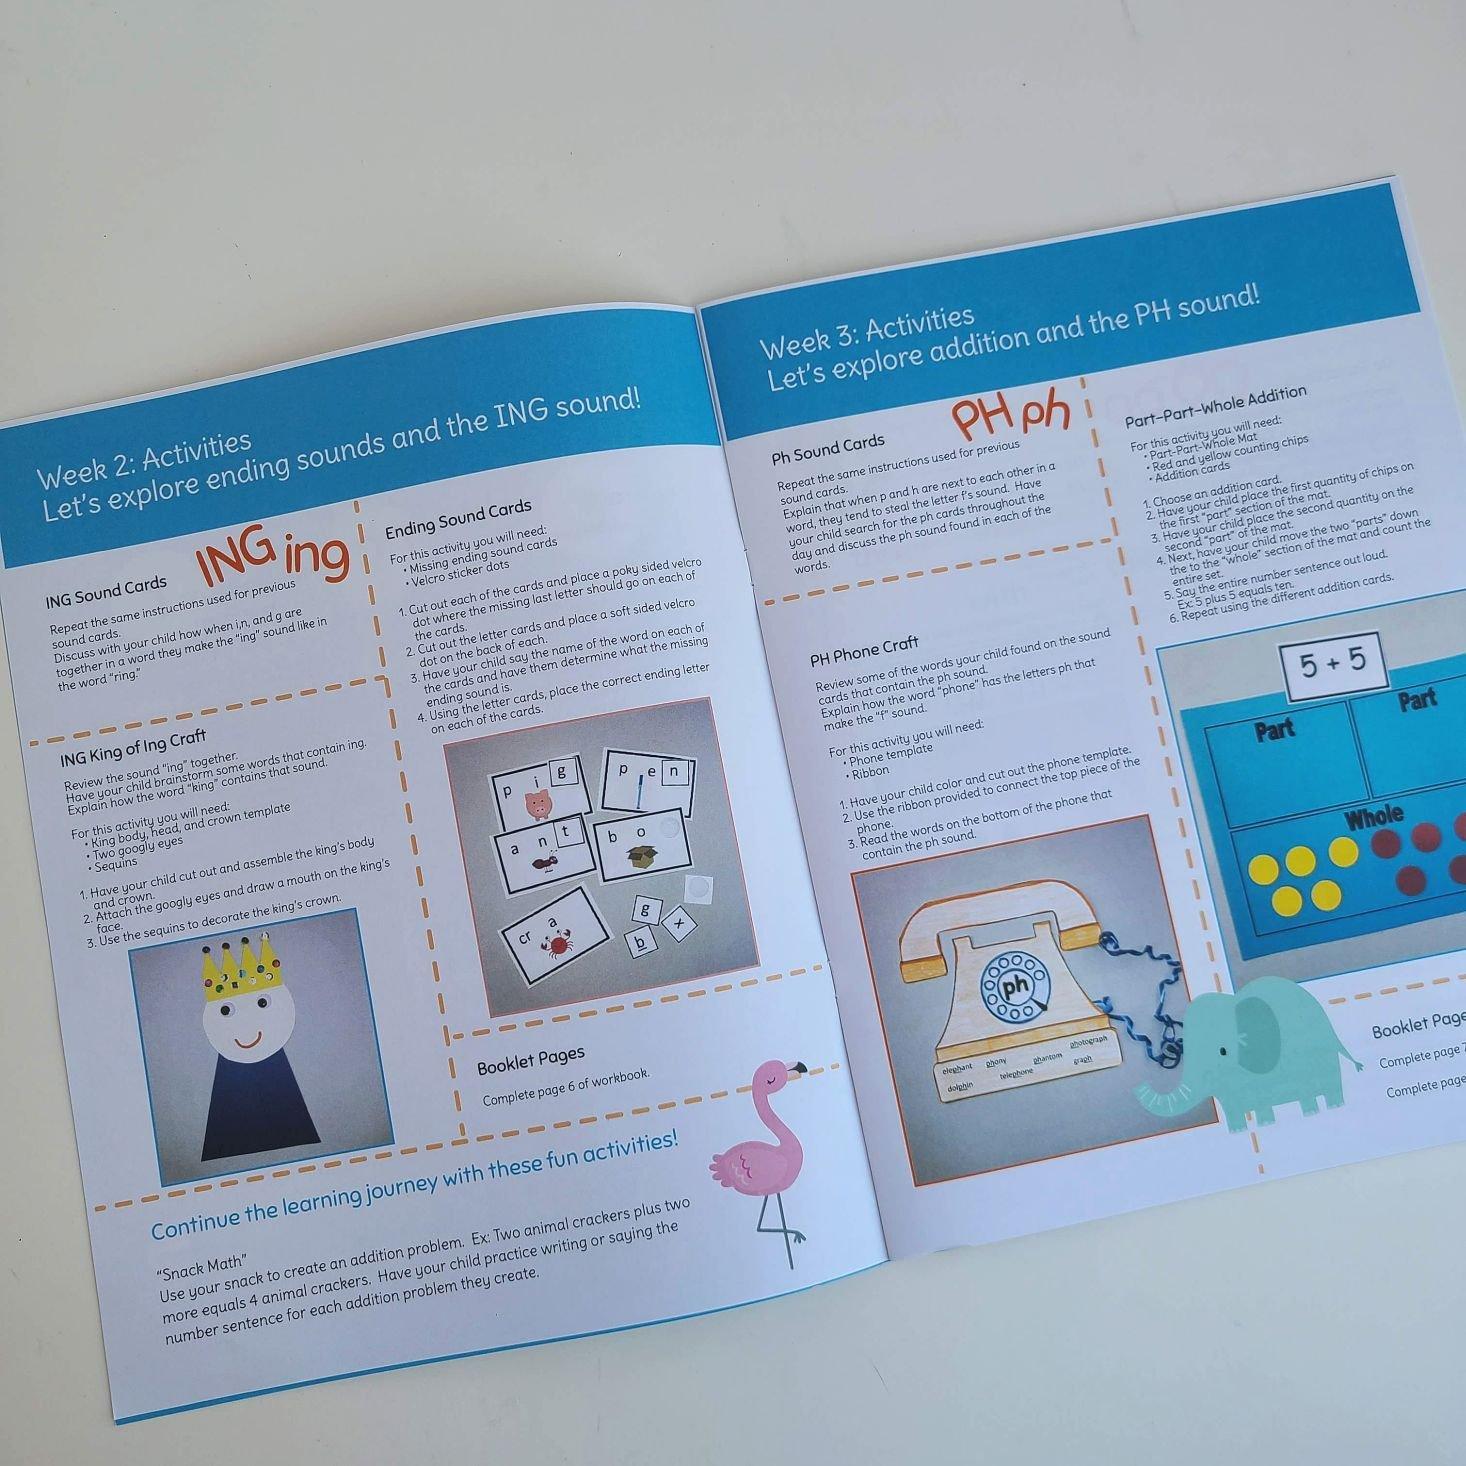 Preschool Box October 2020 parent guide week 2 and 3